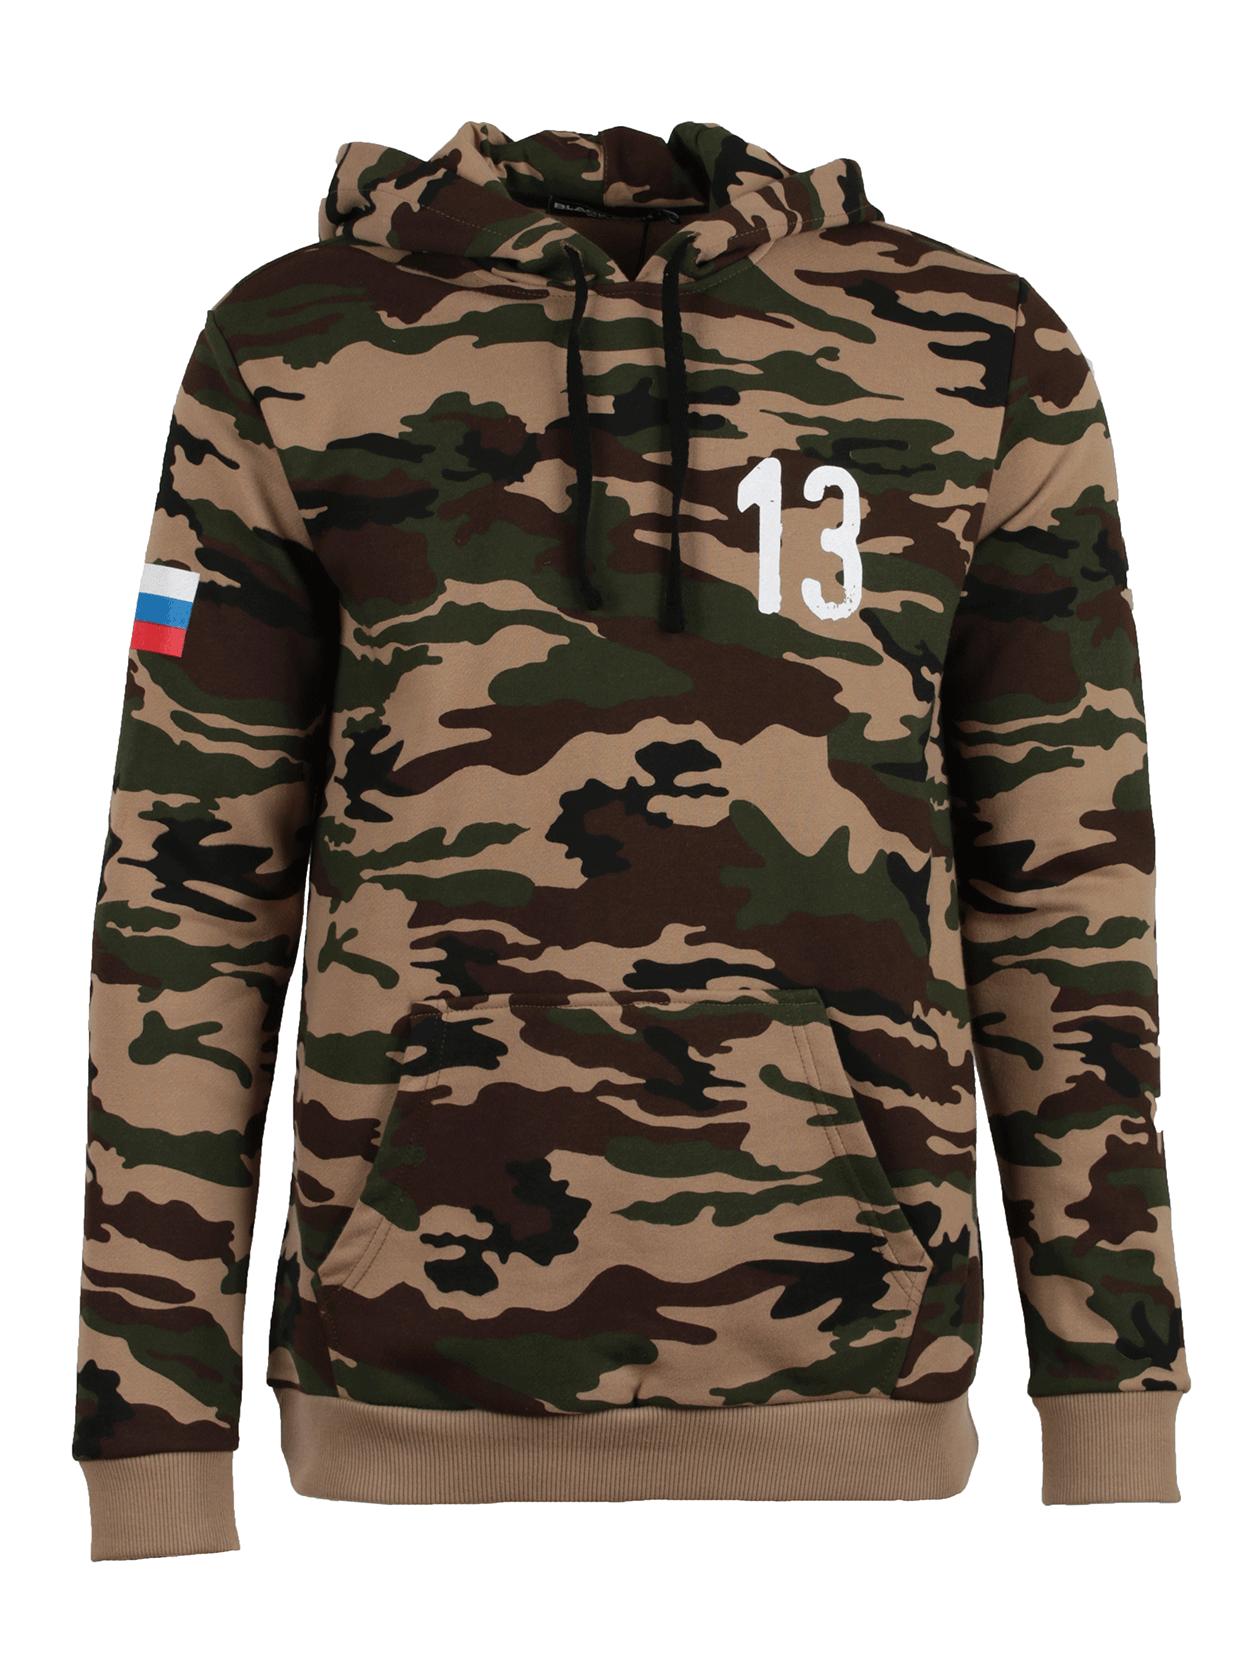 Mens hoodie PROPERTY OF RUSSIA